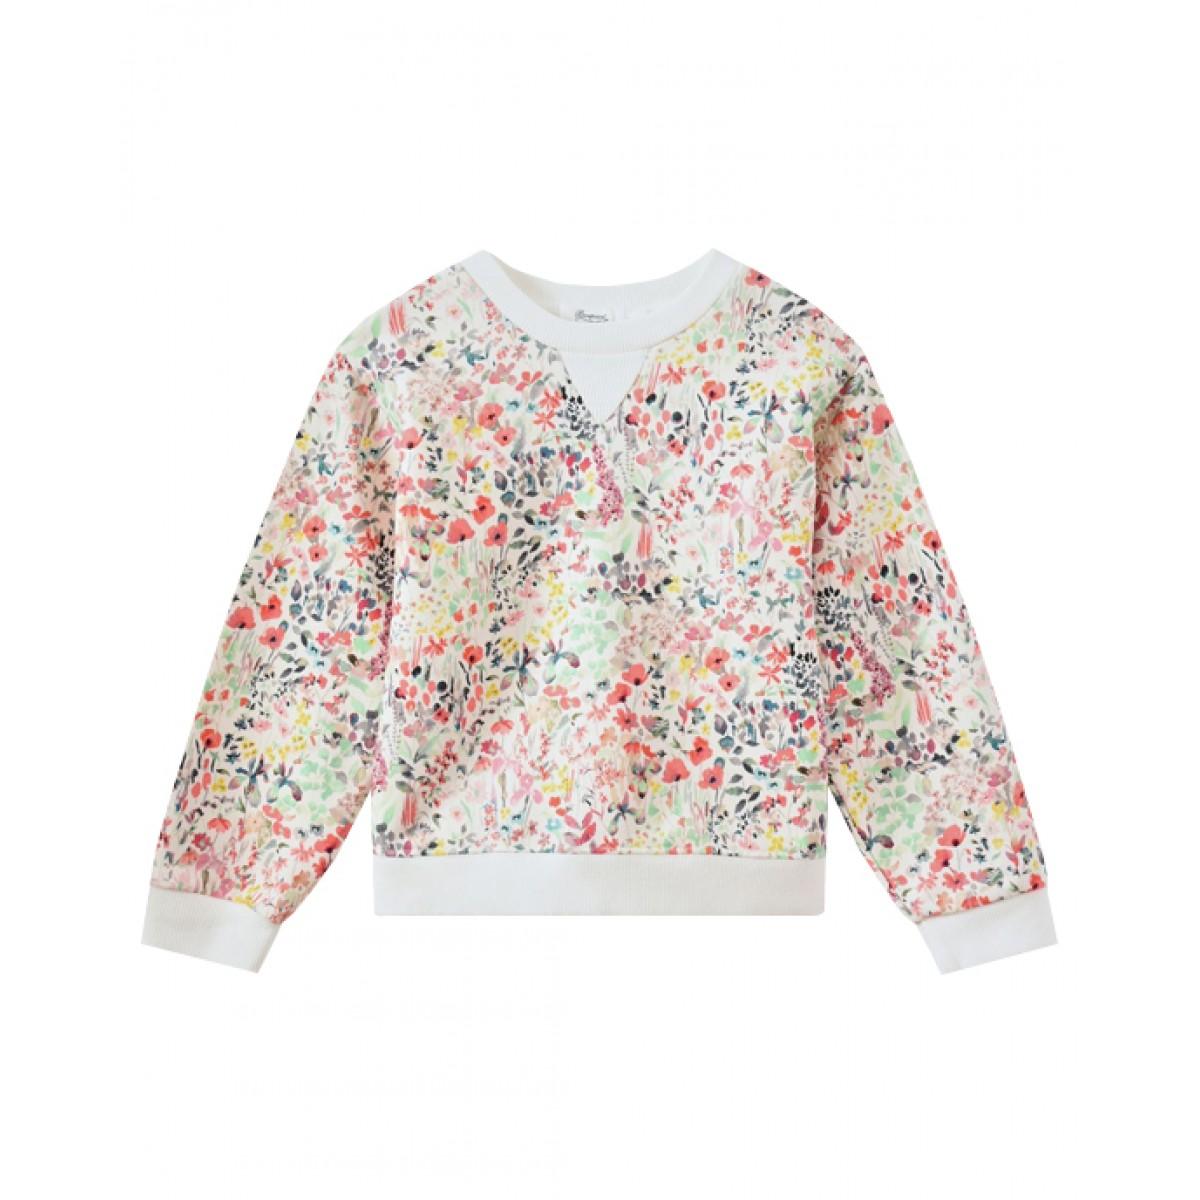 Girls' floral print sweatshirt